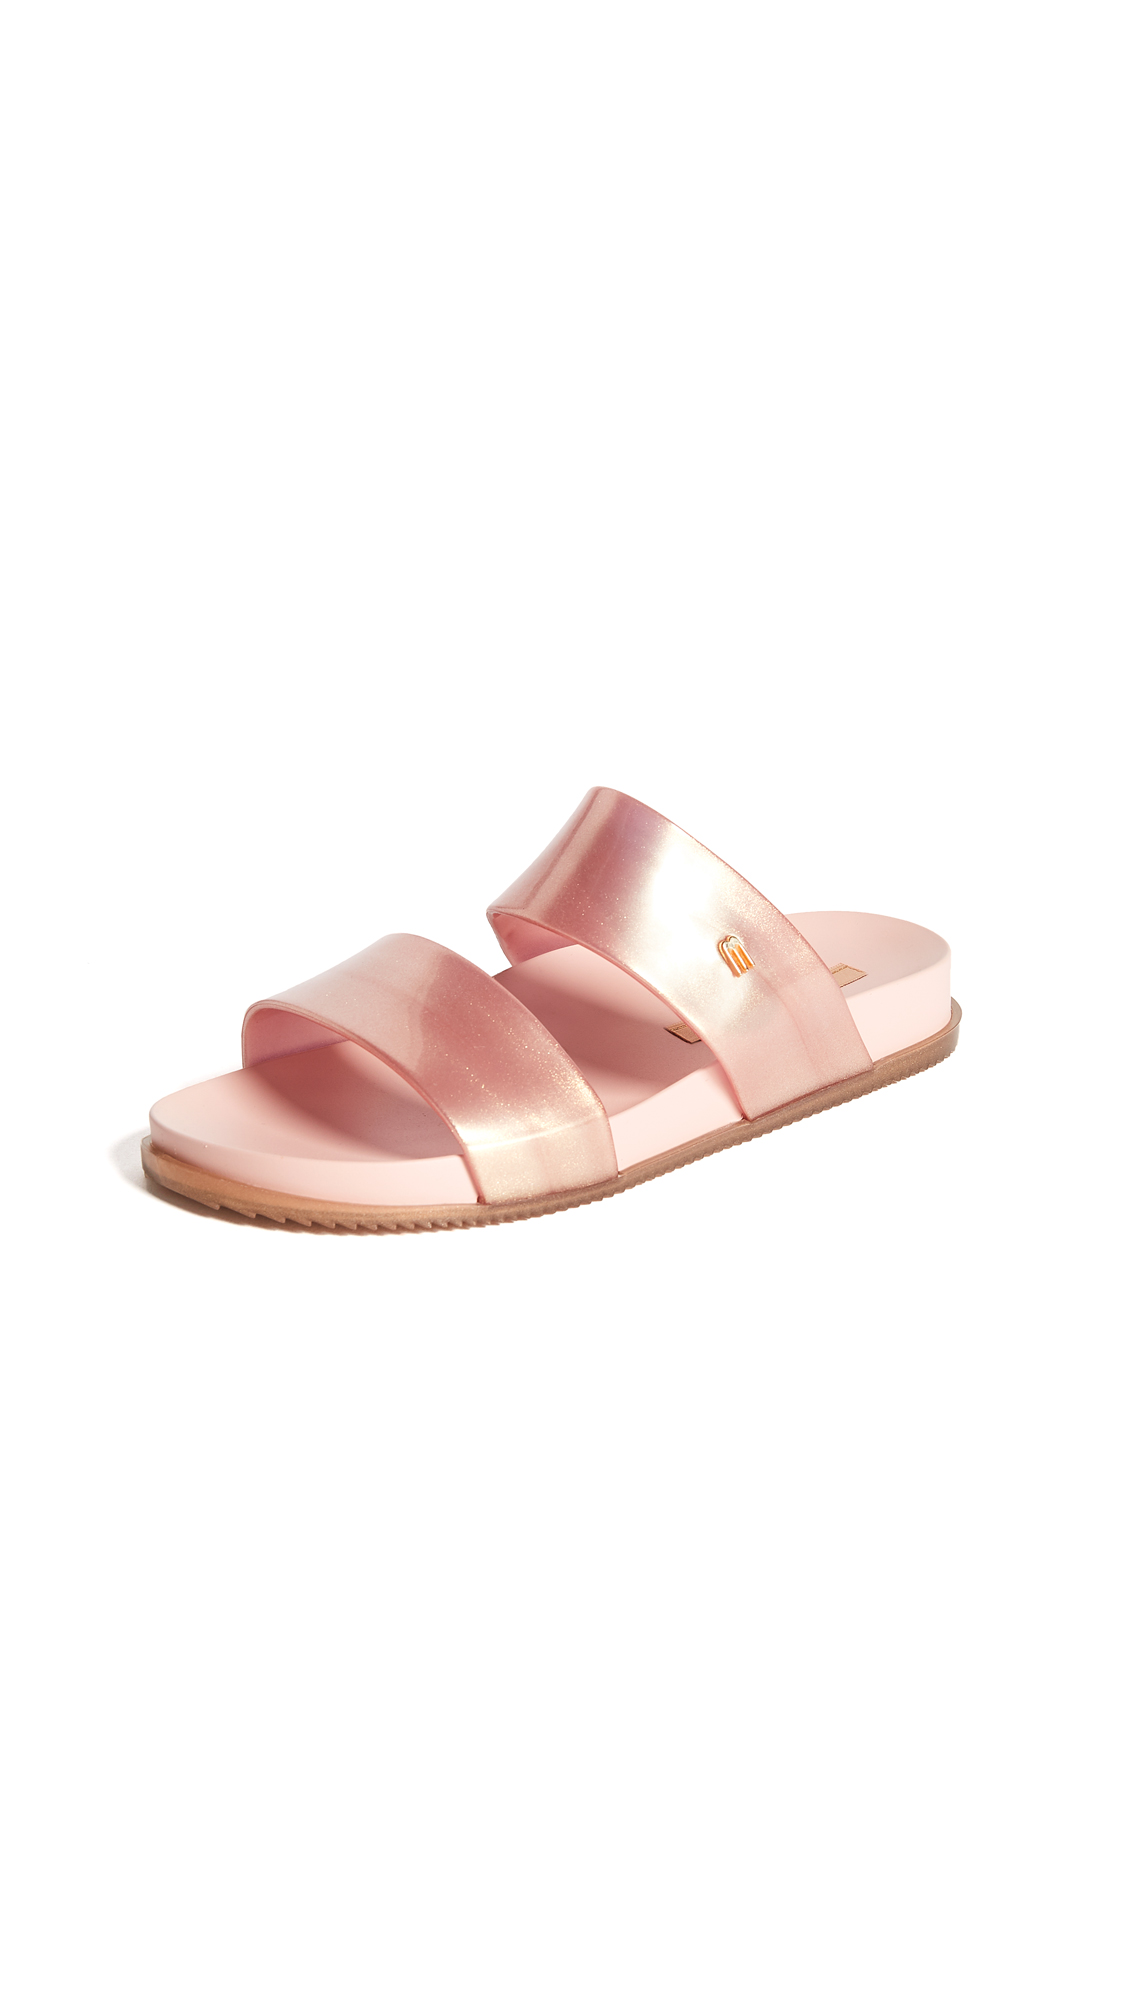 Melissa Cosmic Double Strap Sandals - Metallic Pink